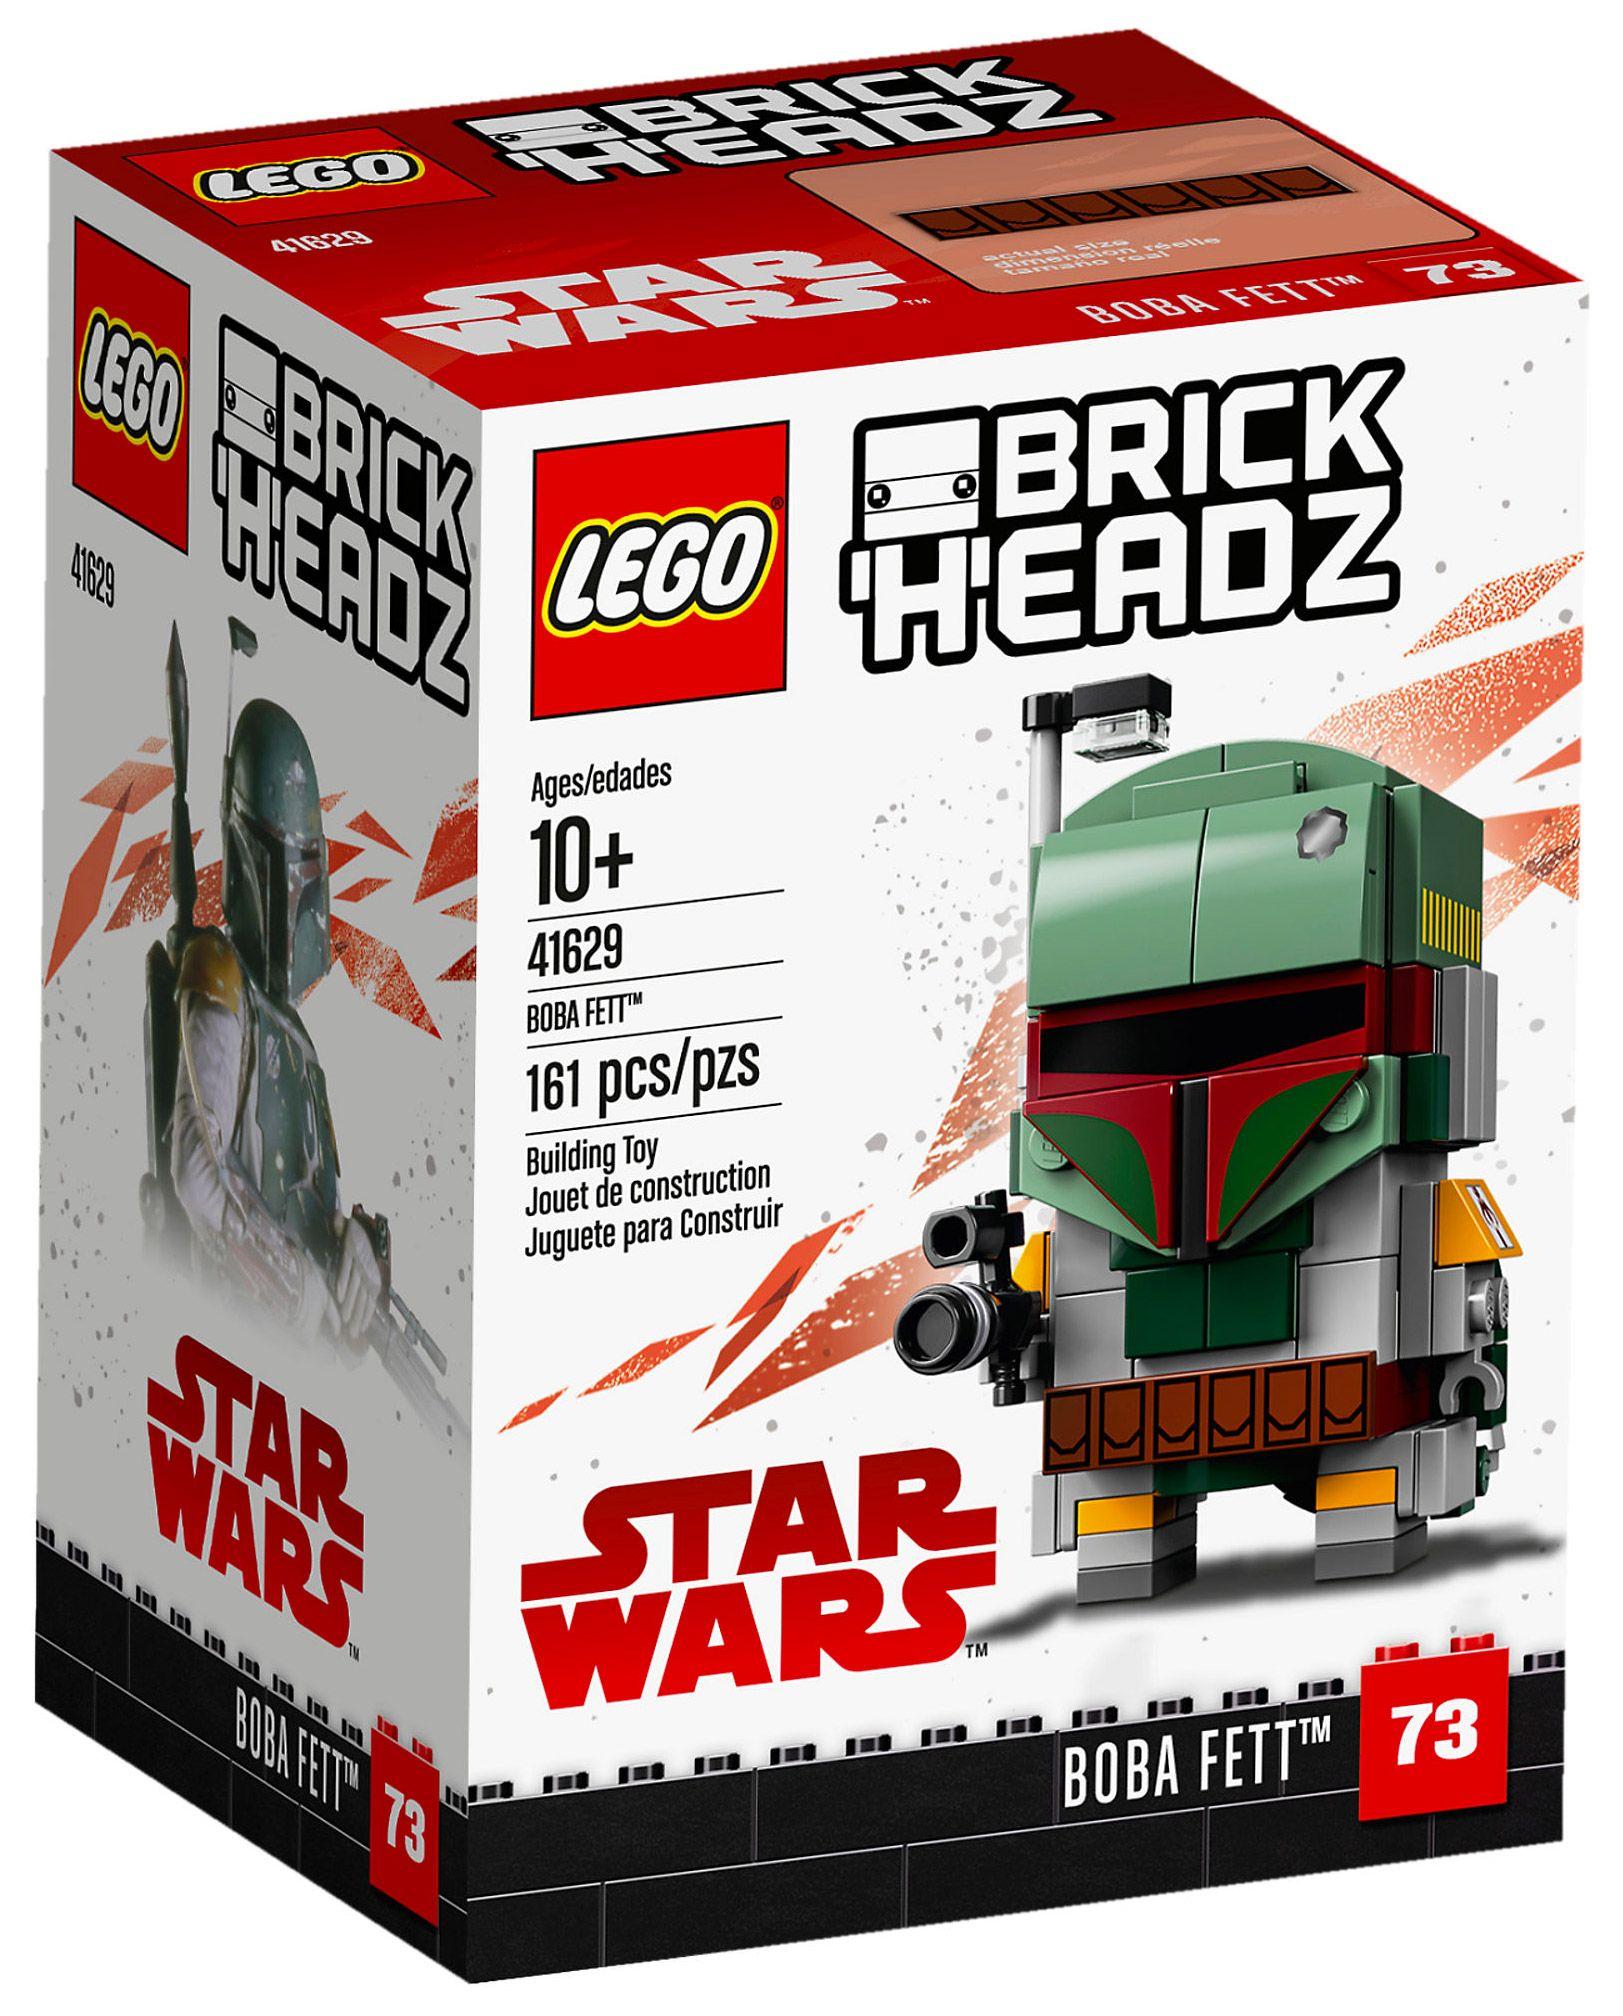 LEGO BRICKHEADZ STAR WARS 41486 Captain Phasma NISB New /& Sealed